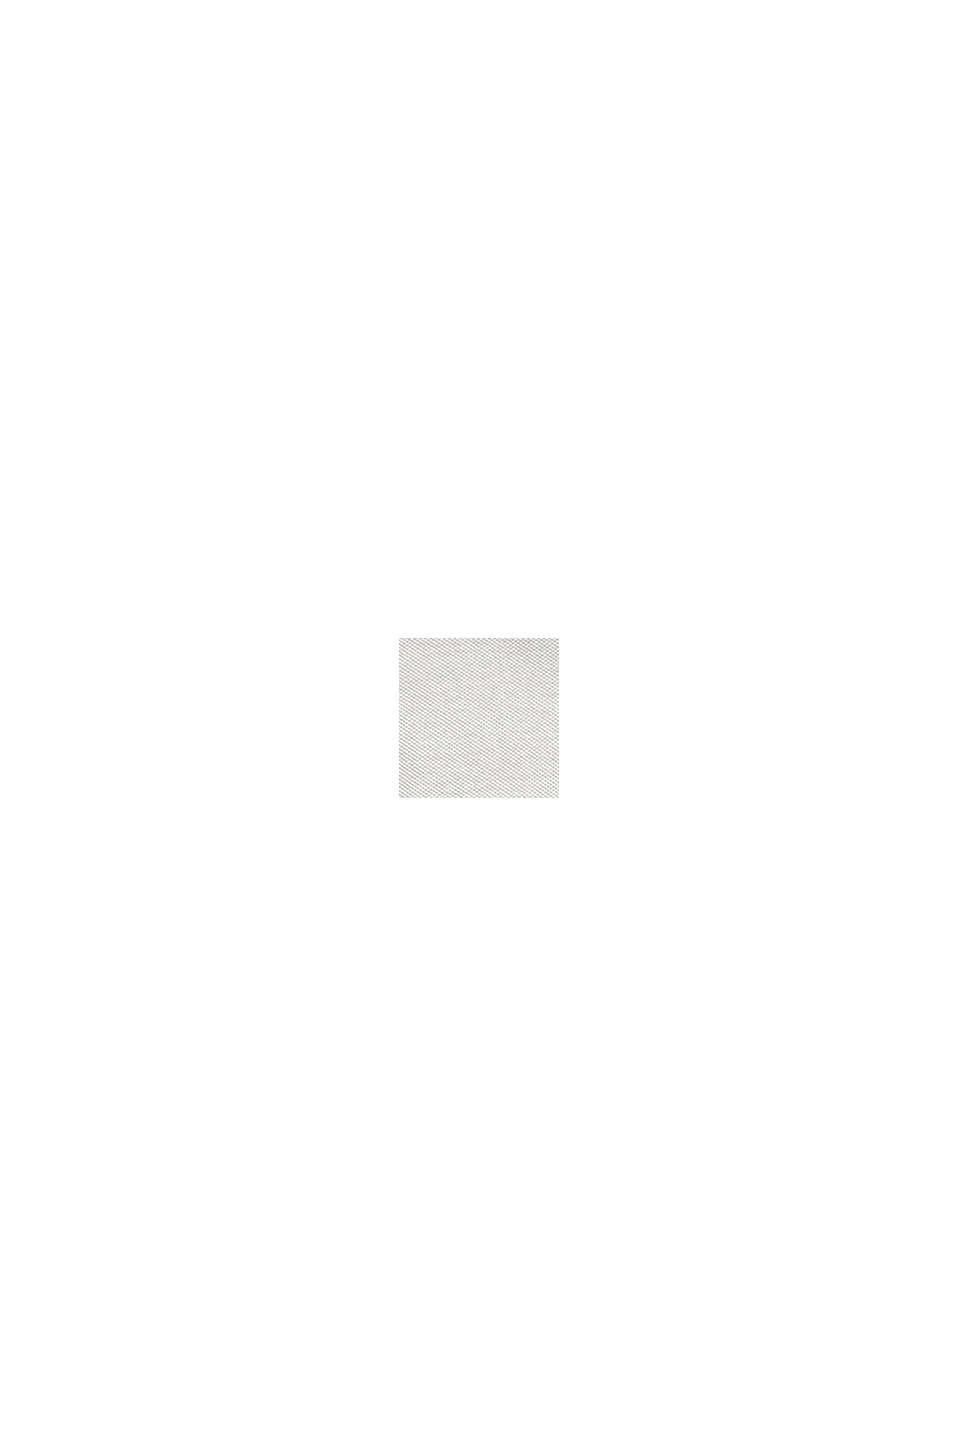 Jersey-Sakko aus 100% Baumwolle, LIGHT KHAKI, swatch